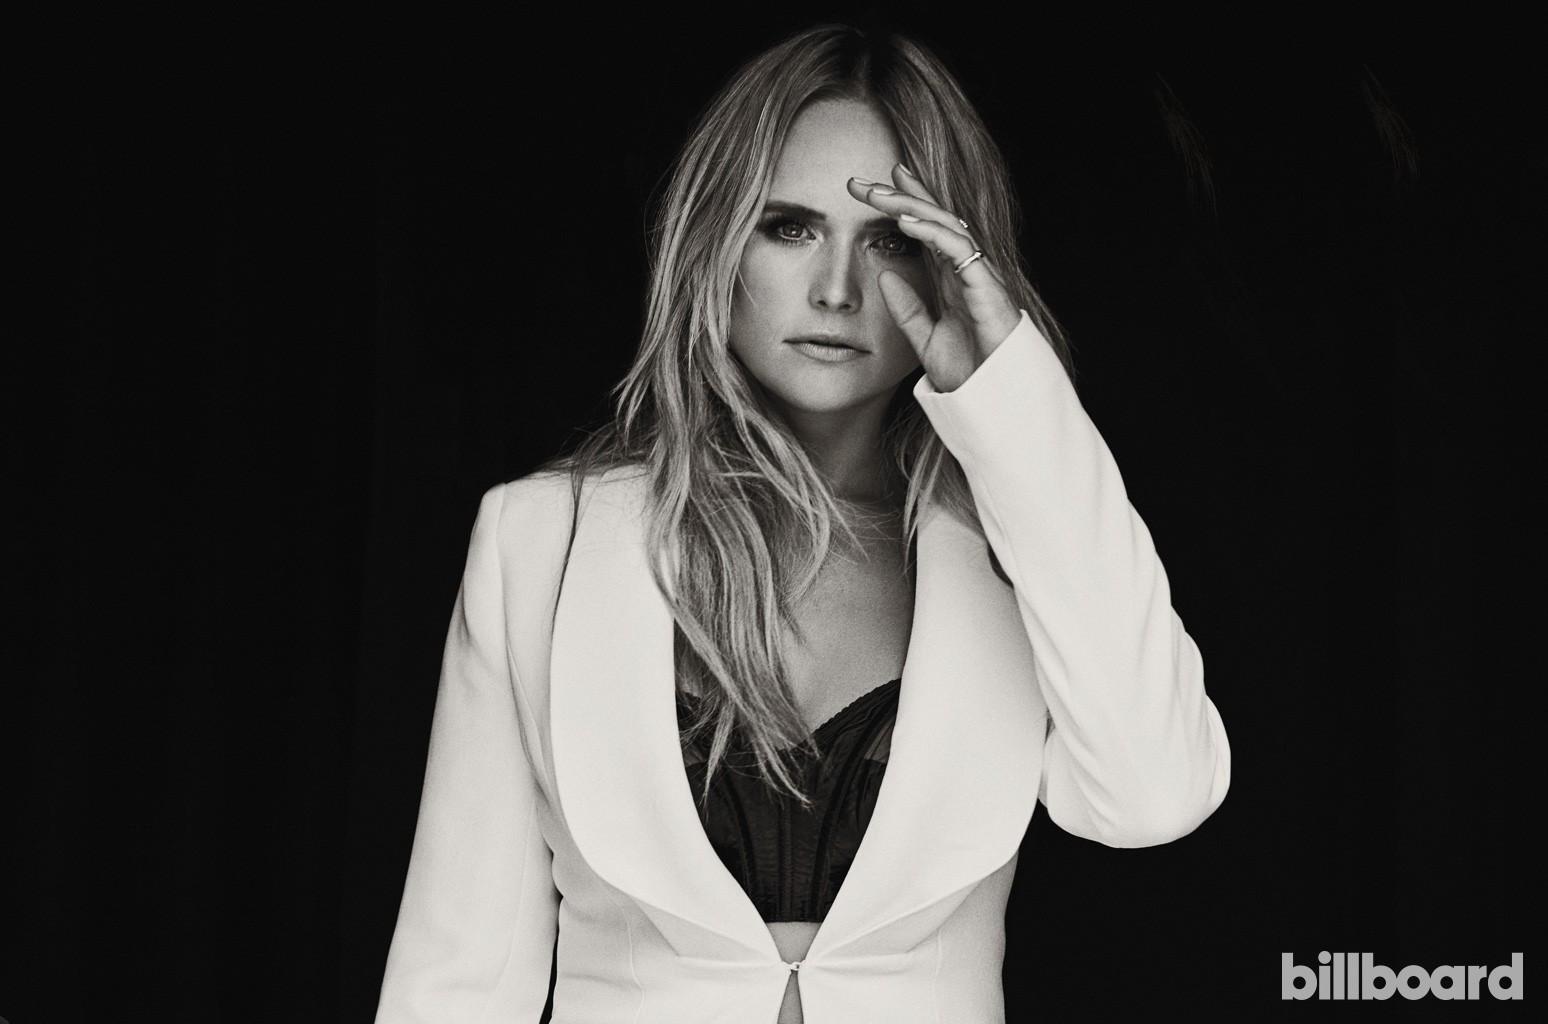 Miranda Lambert Sets 3-Night Concert Run in Texas: 'We're Doing This Safely & Right' - Billboard